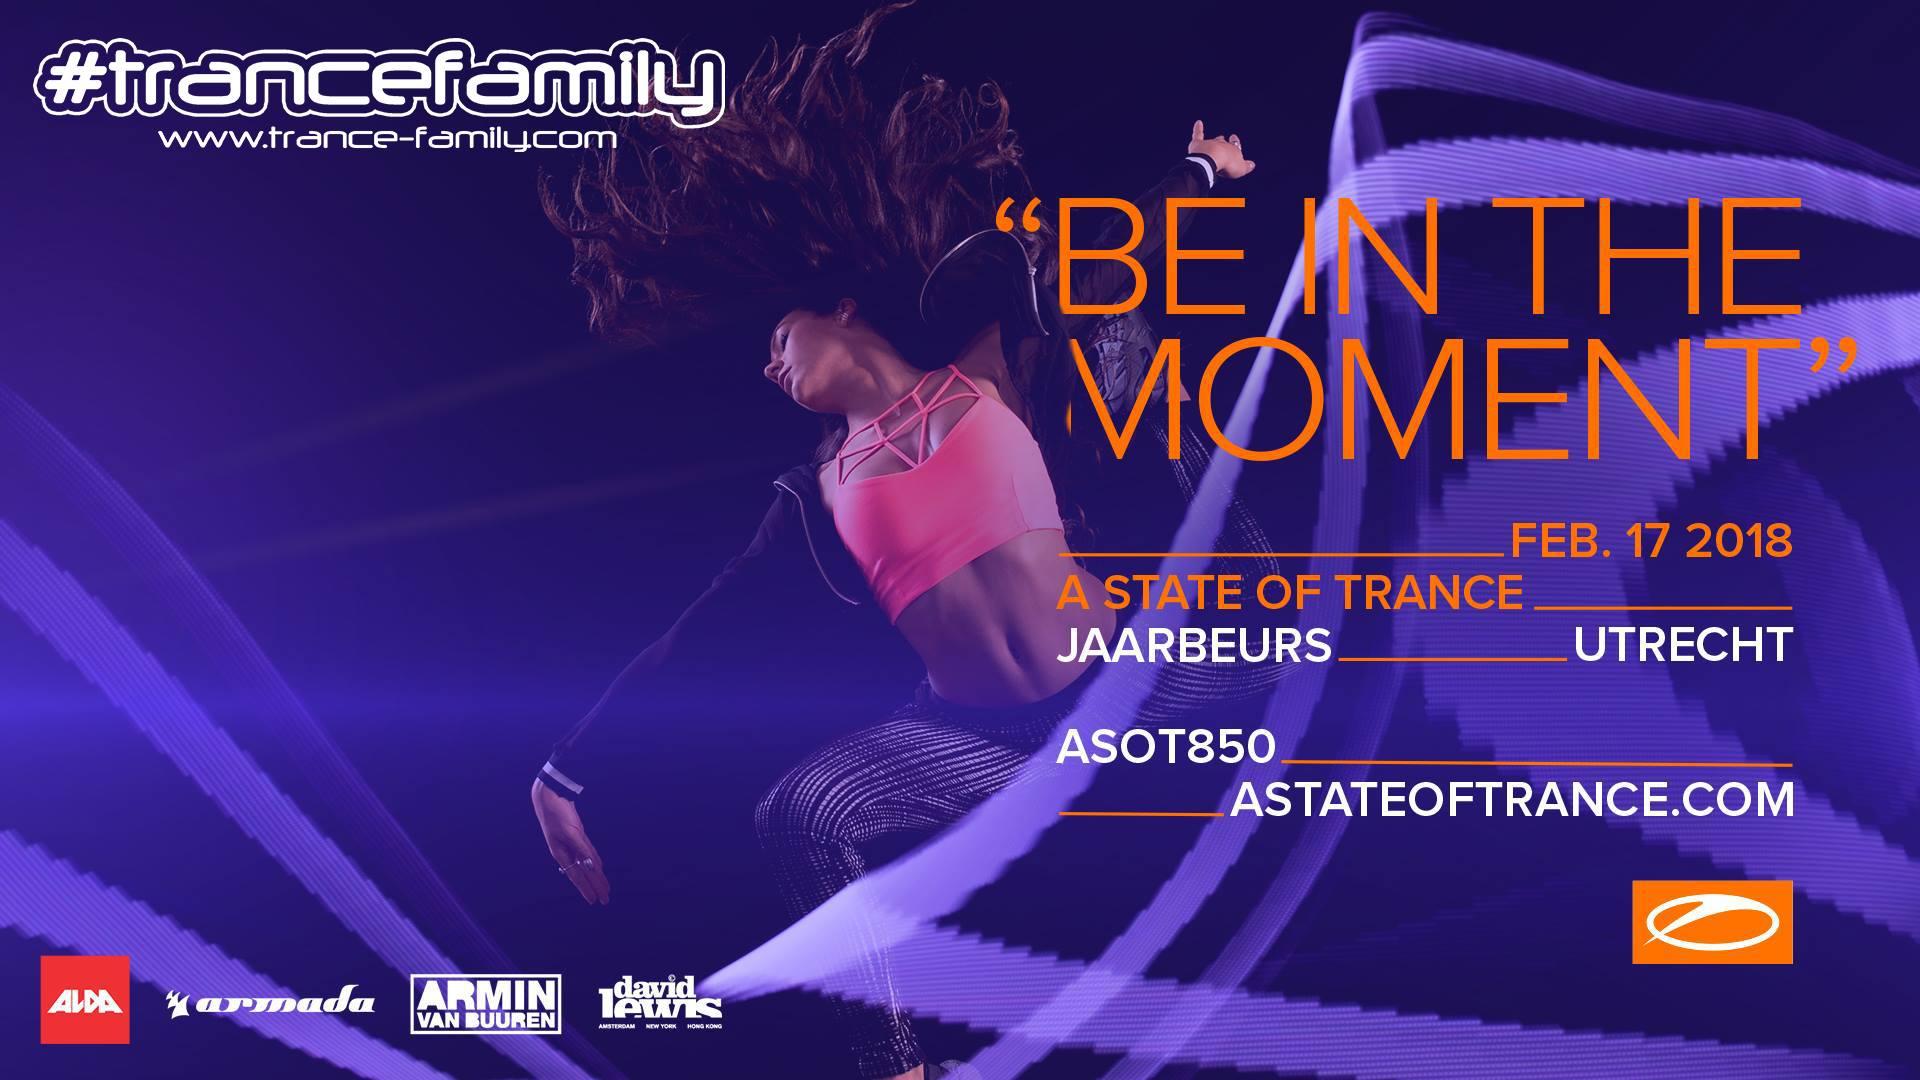 17.02.2018 A State Of Trance Festival 850, Utrecht (NL)